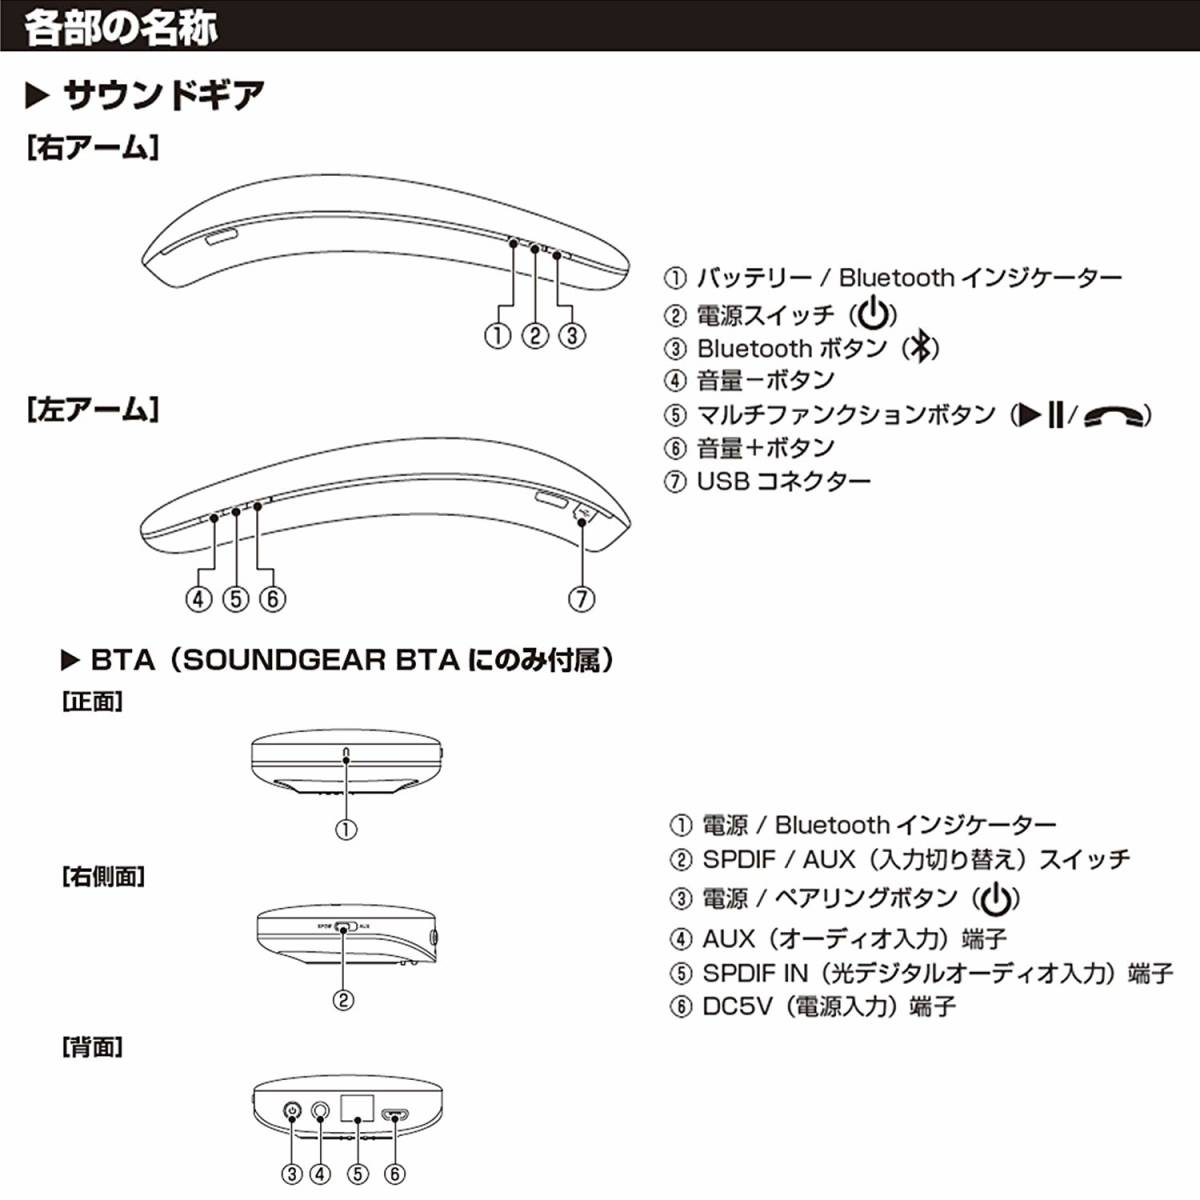 JBL SoundGear ウェアラブル ネックスピーカー Bluetooth/apt-X対応/31mm径スピーカー4基搭載 JBLSOUNDGEARBLK 国内正規品メーカー1年保証_画像8